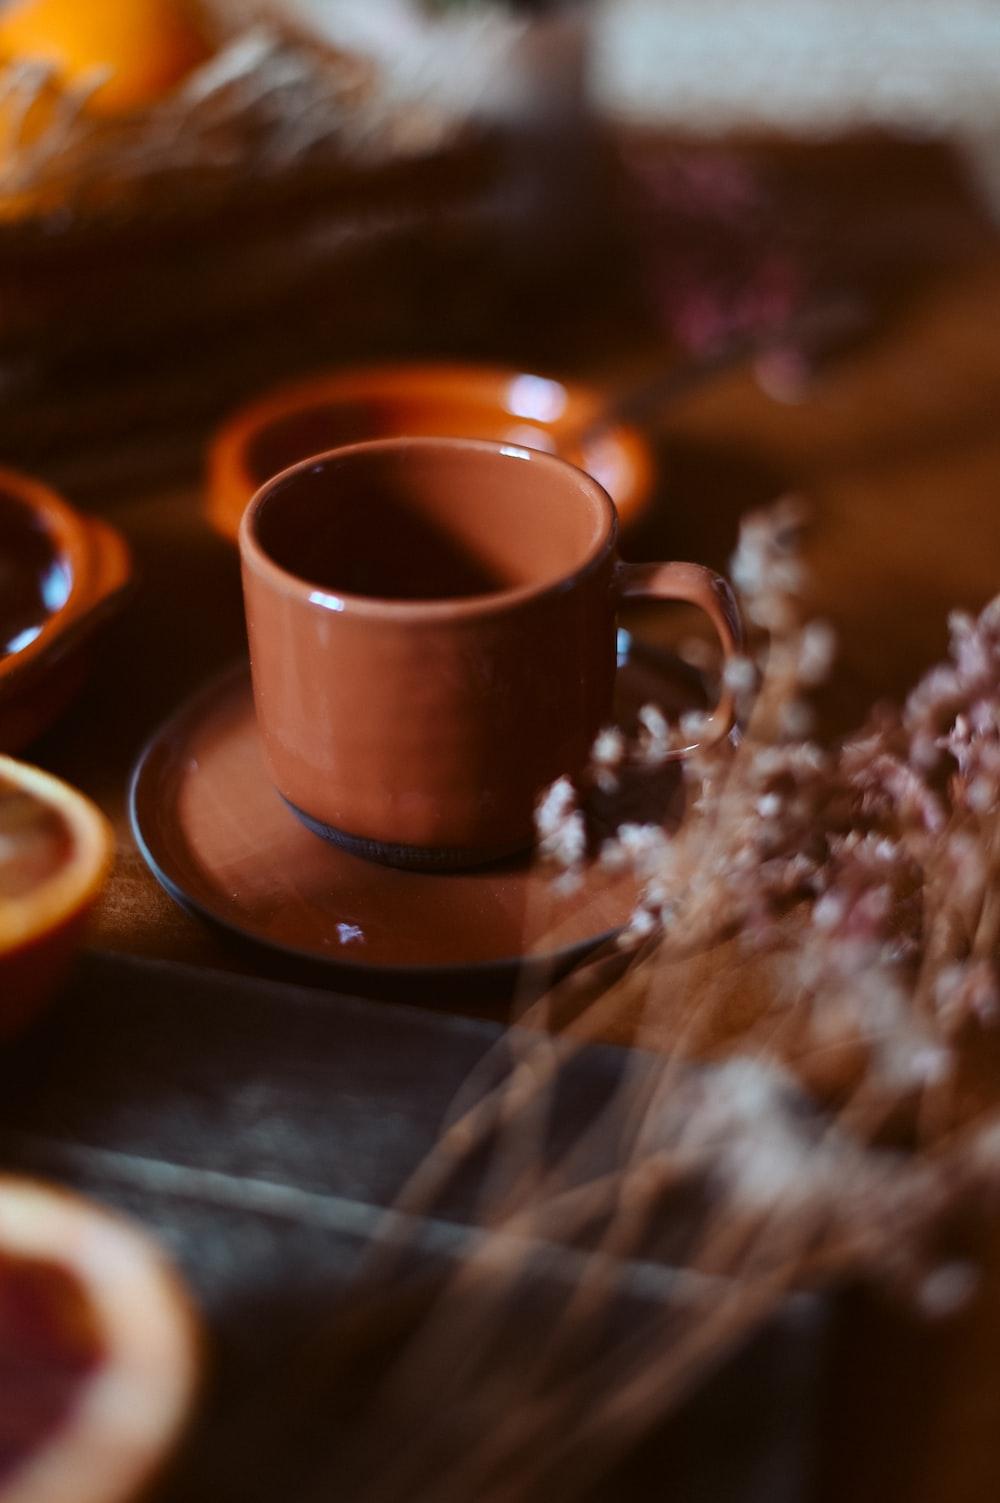 brown ceramic mug on brown saucer